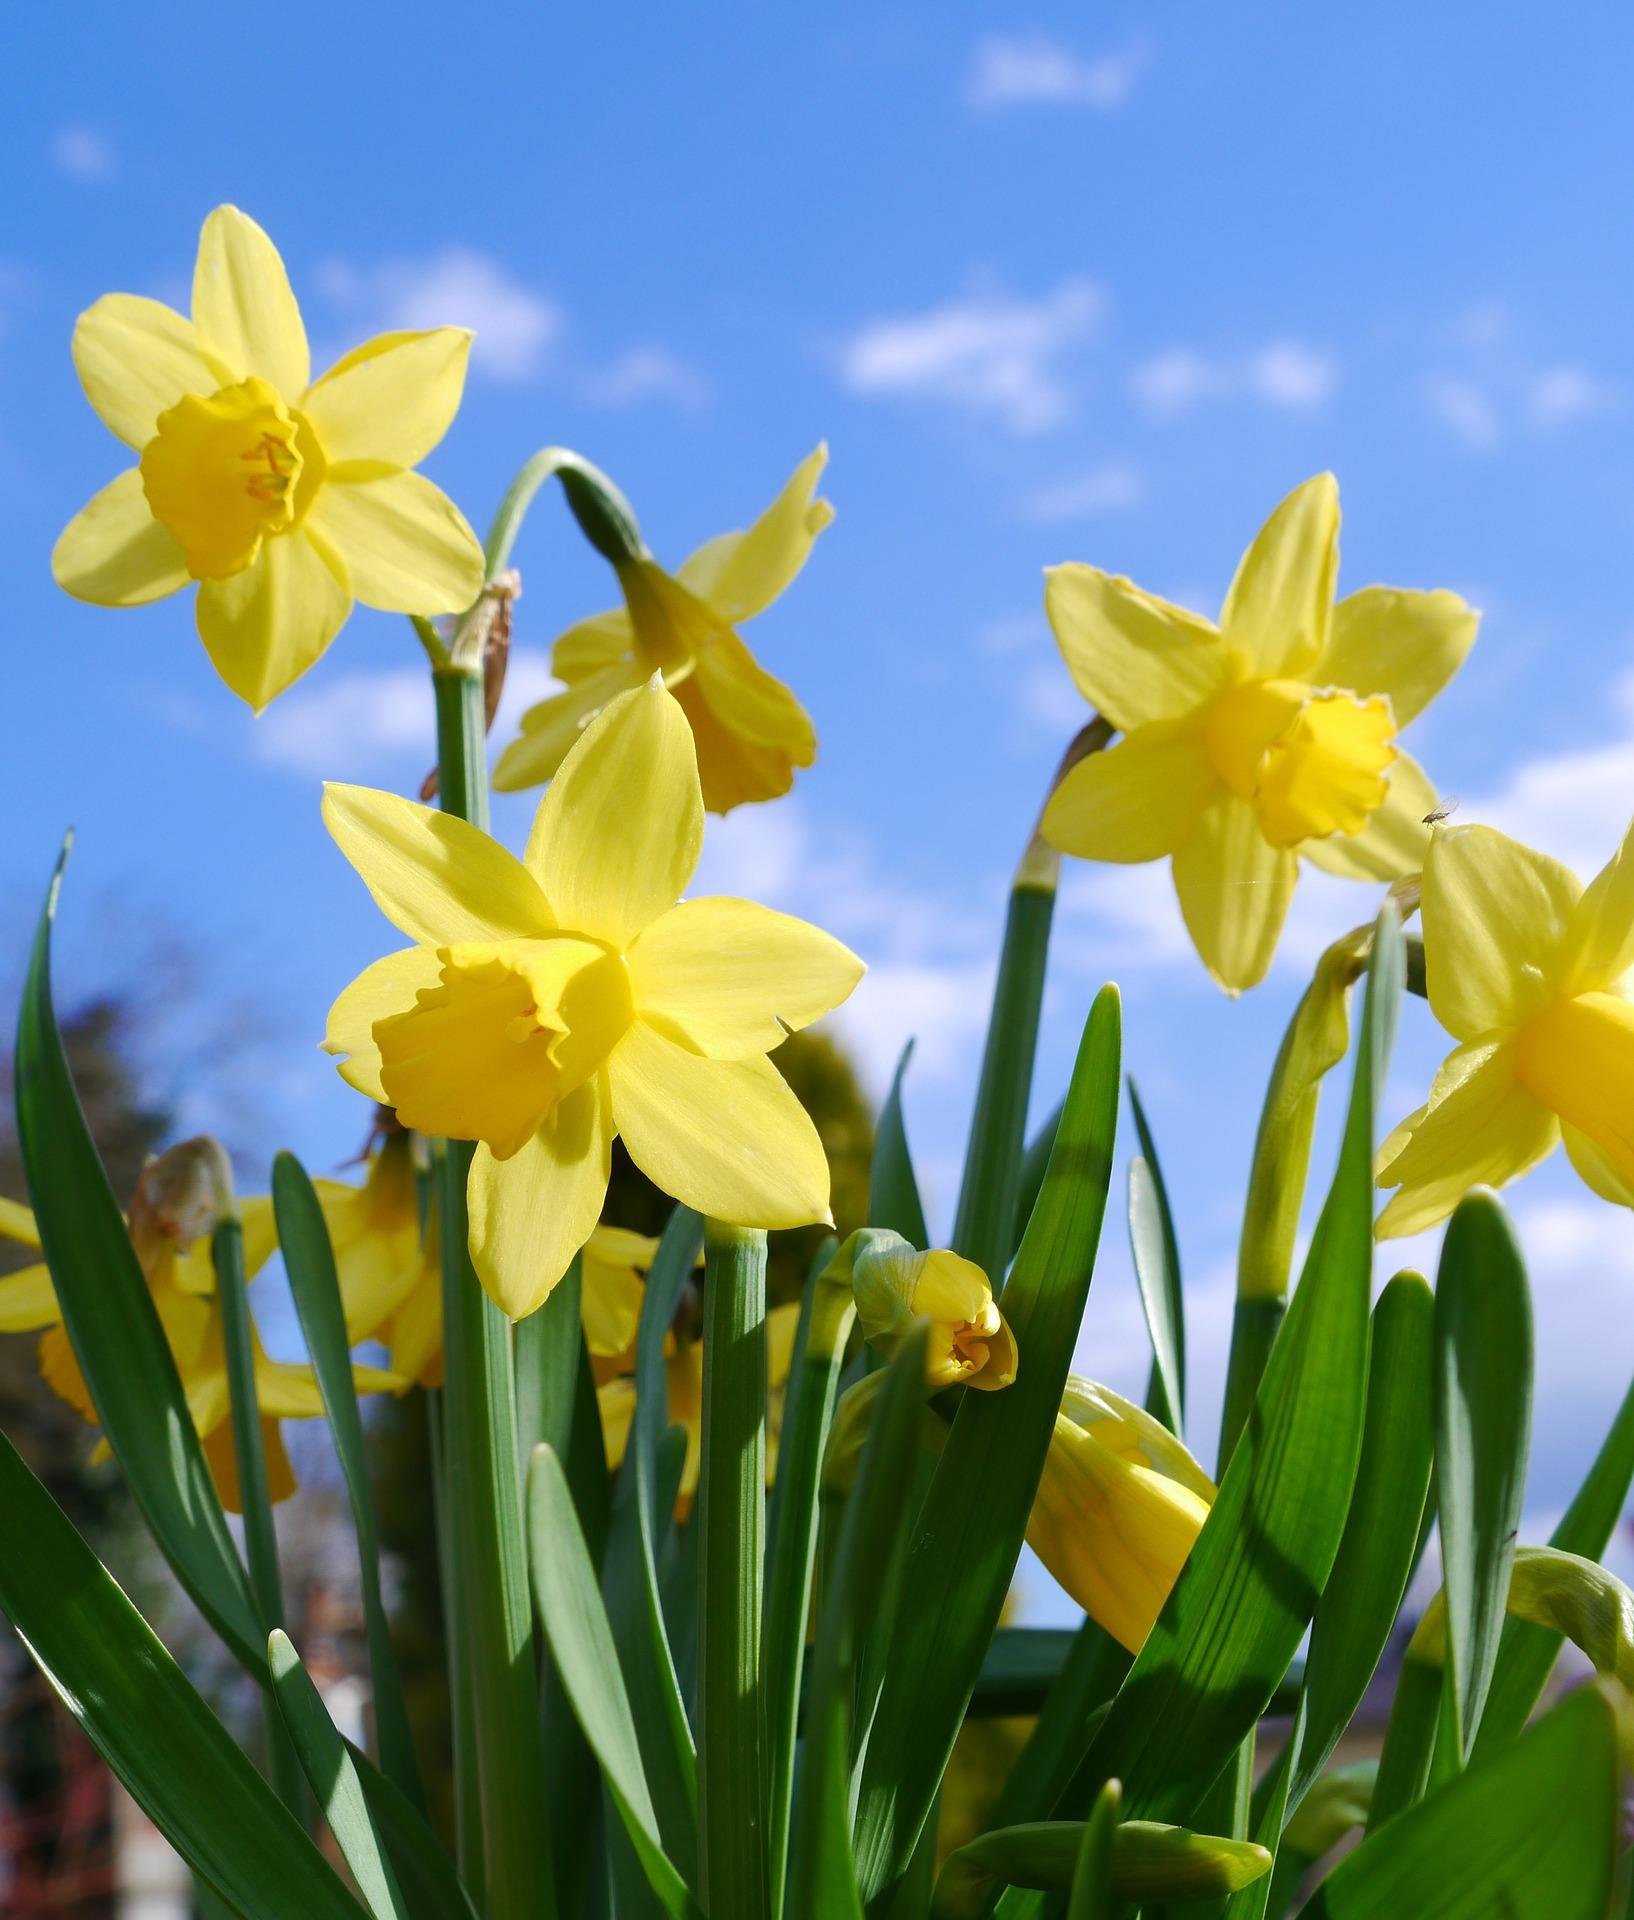 daffodils-2127010_1920